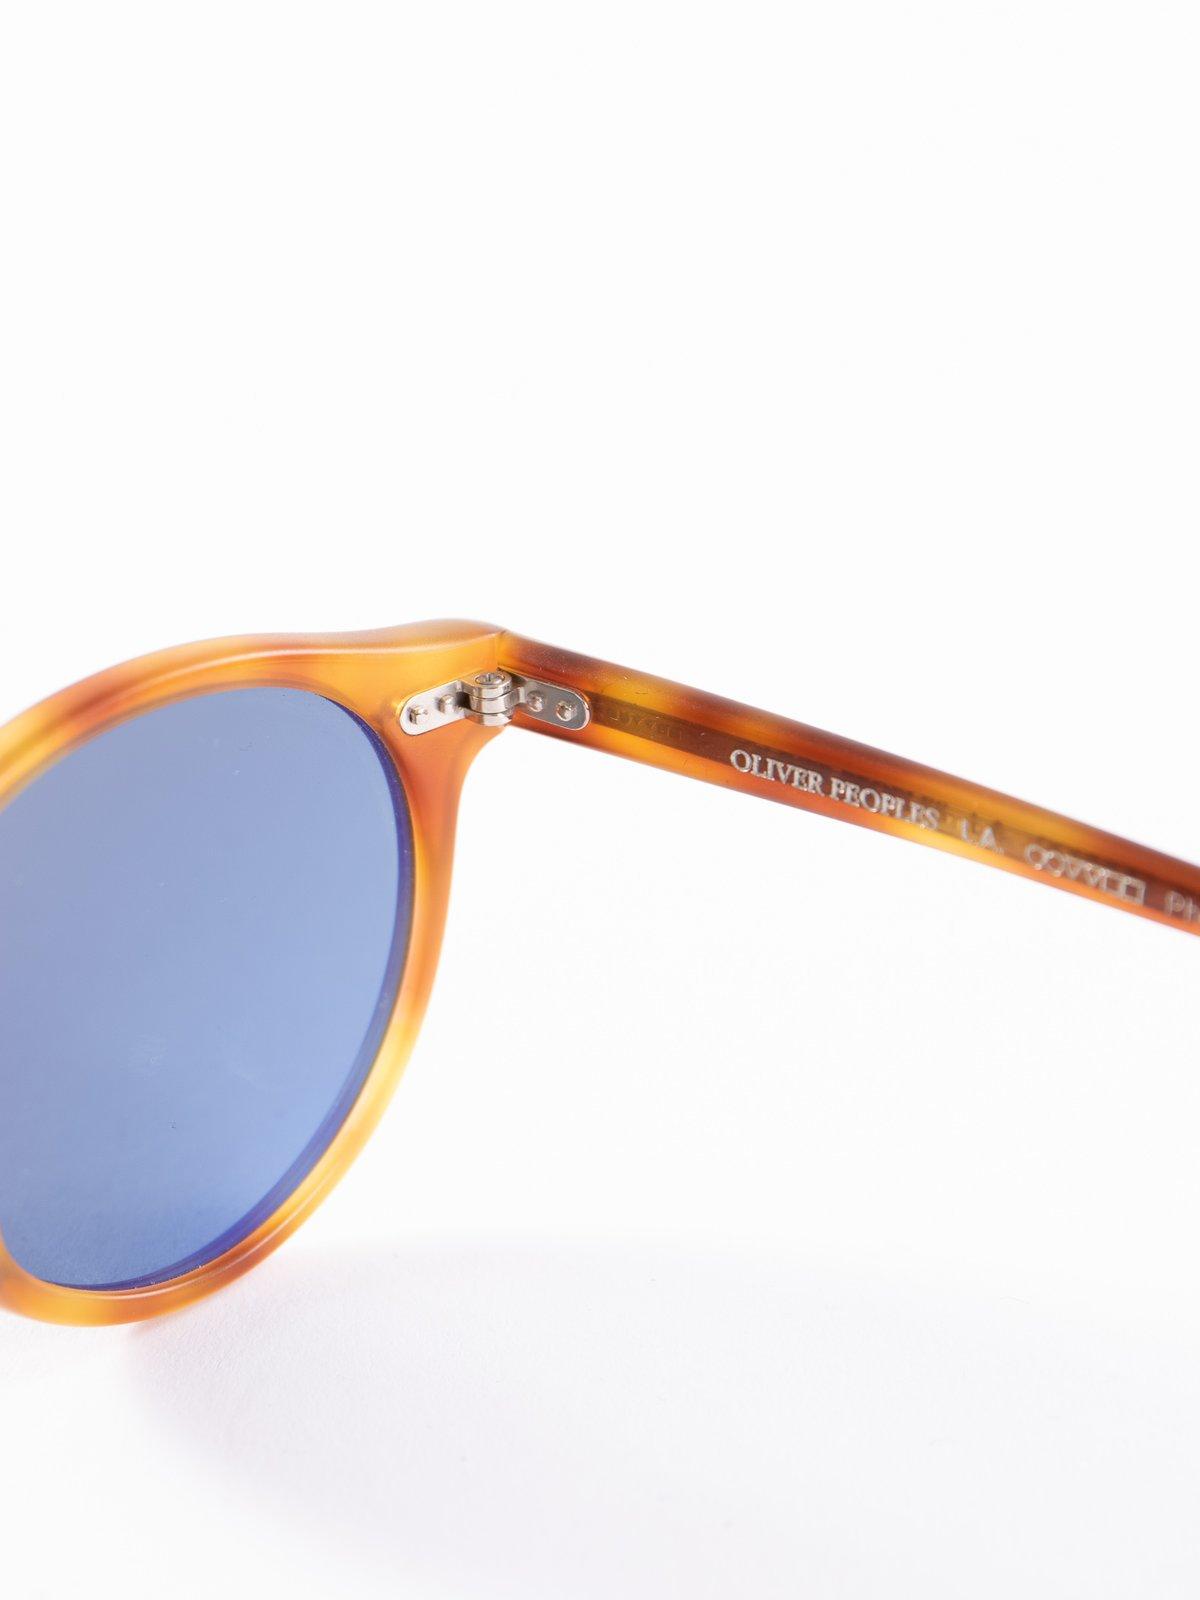 Semi–Matte LBR/Blue Photochromic Gregory Peck Sunglasses - Image 4